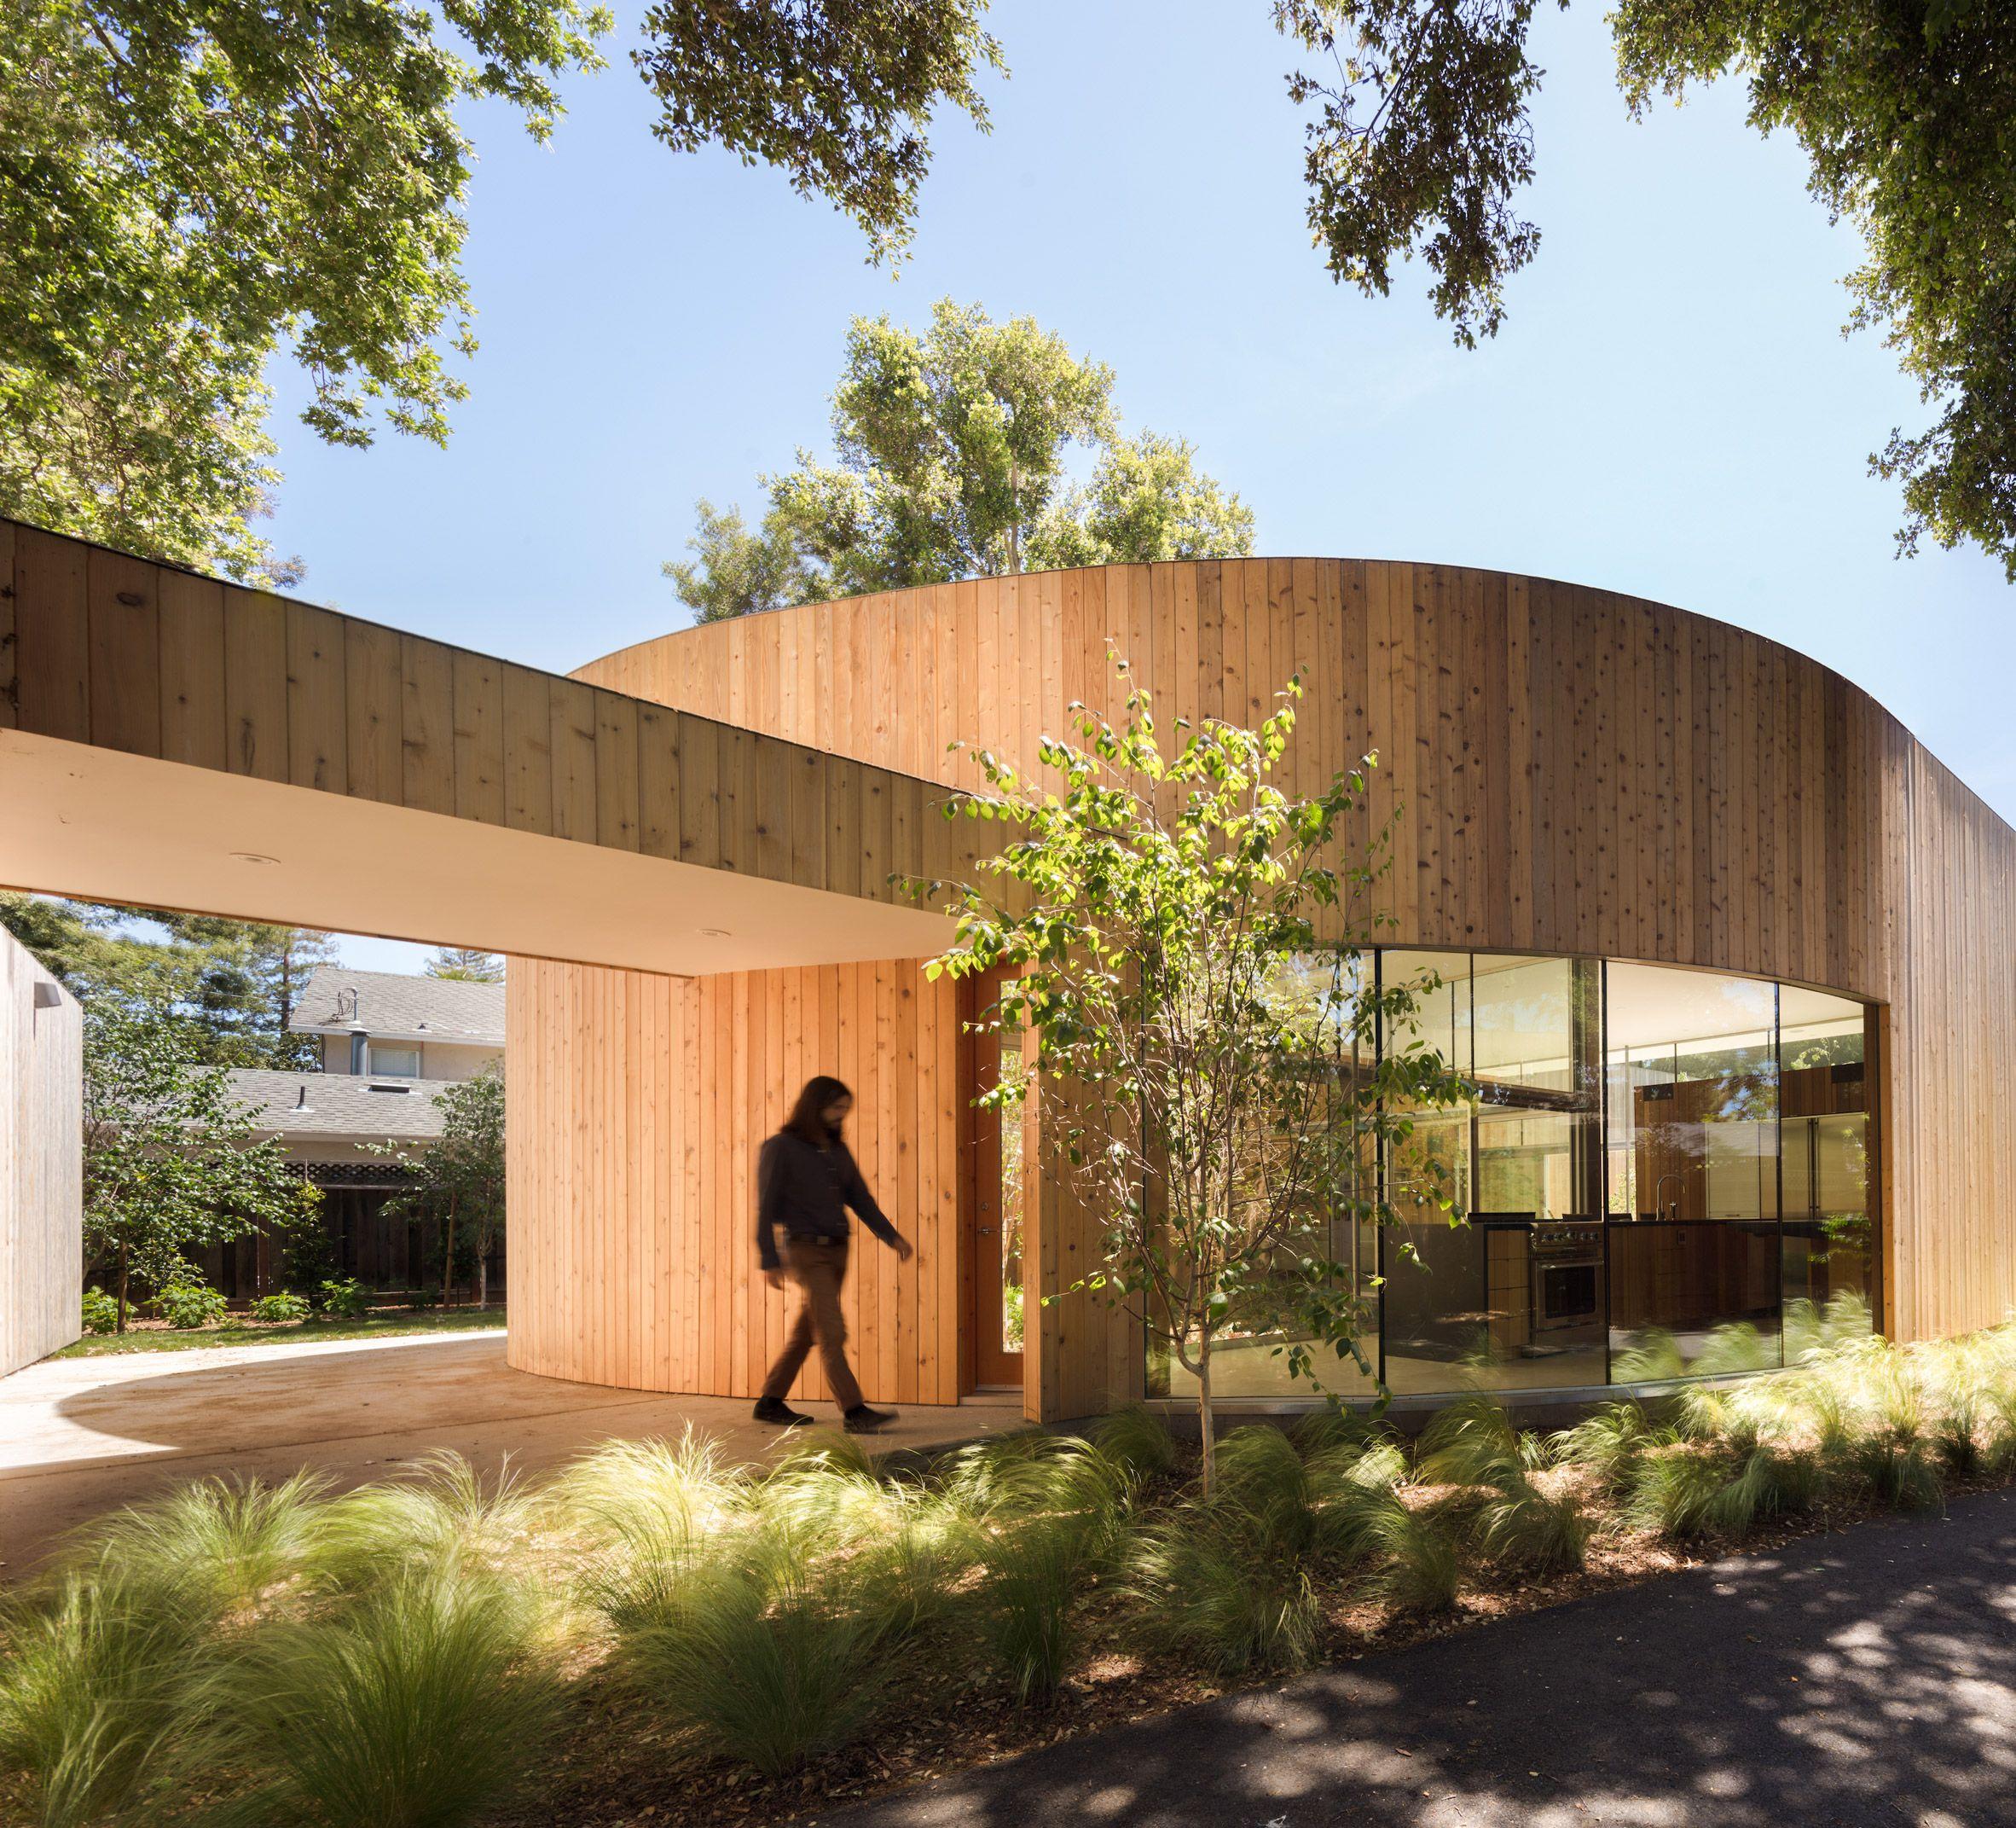 Einfaches hausdesign naksha roofless house by craig steely  buildingoutdoor  pinterest